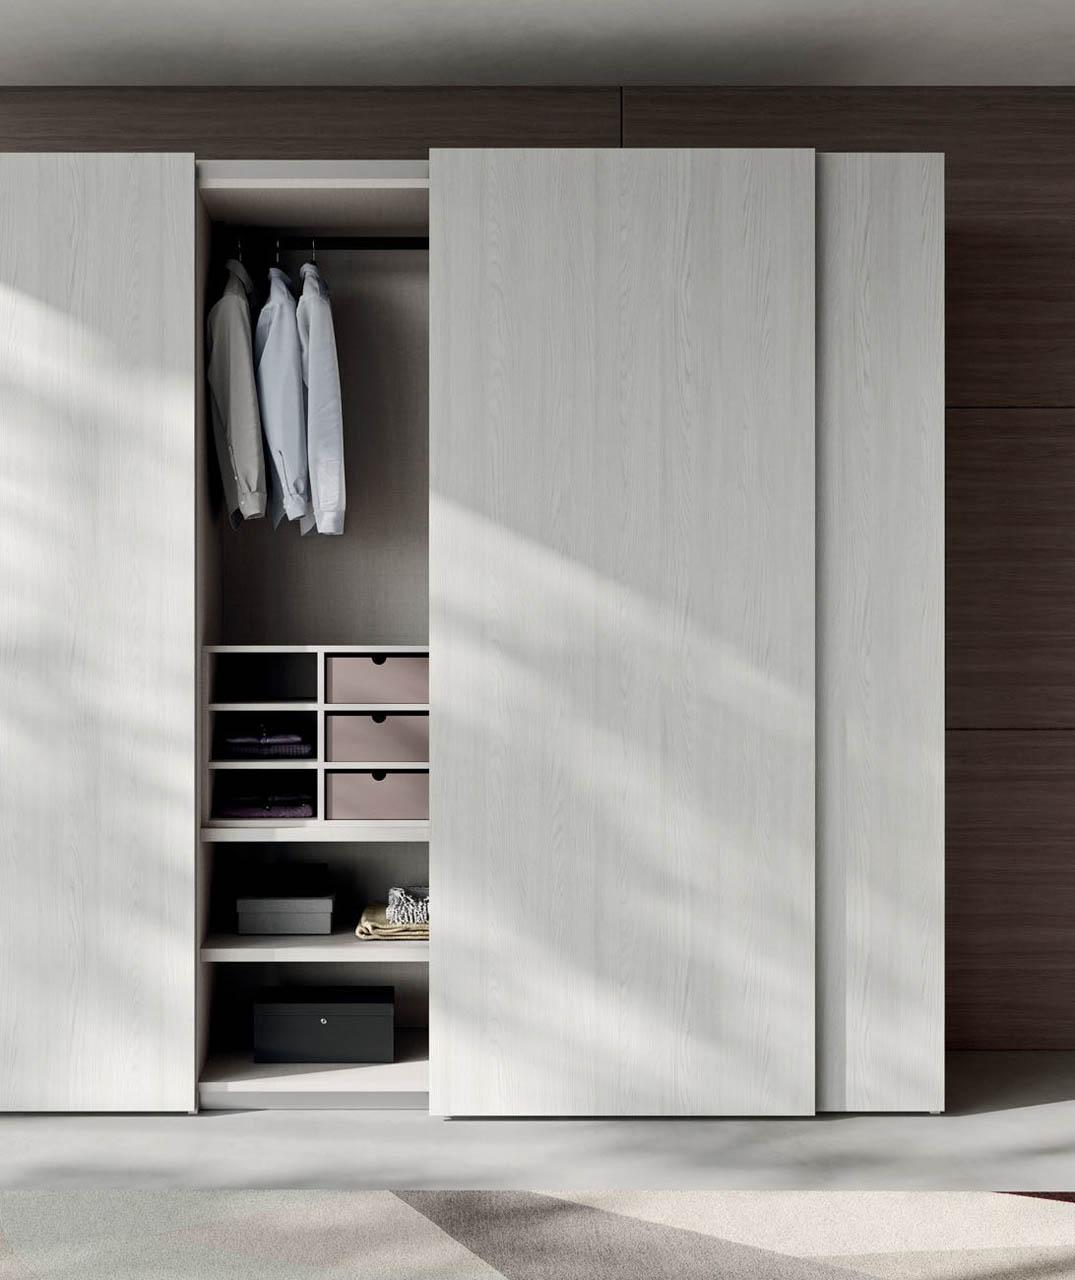 armadio-scorrevole-anta-arka-3-orme-1092x1300